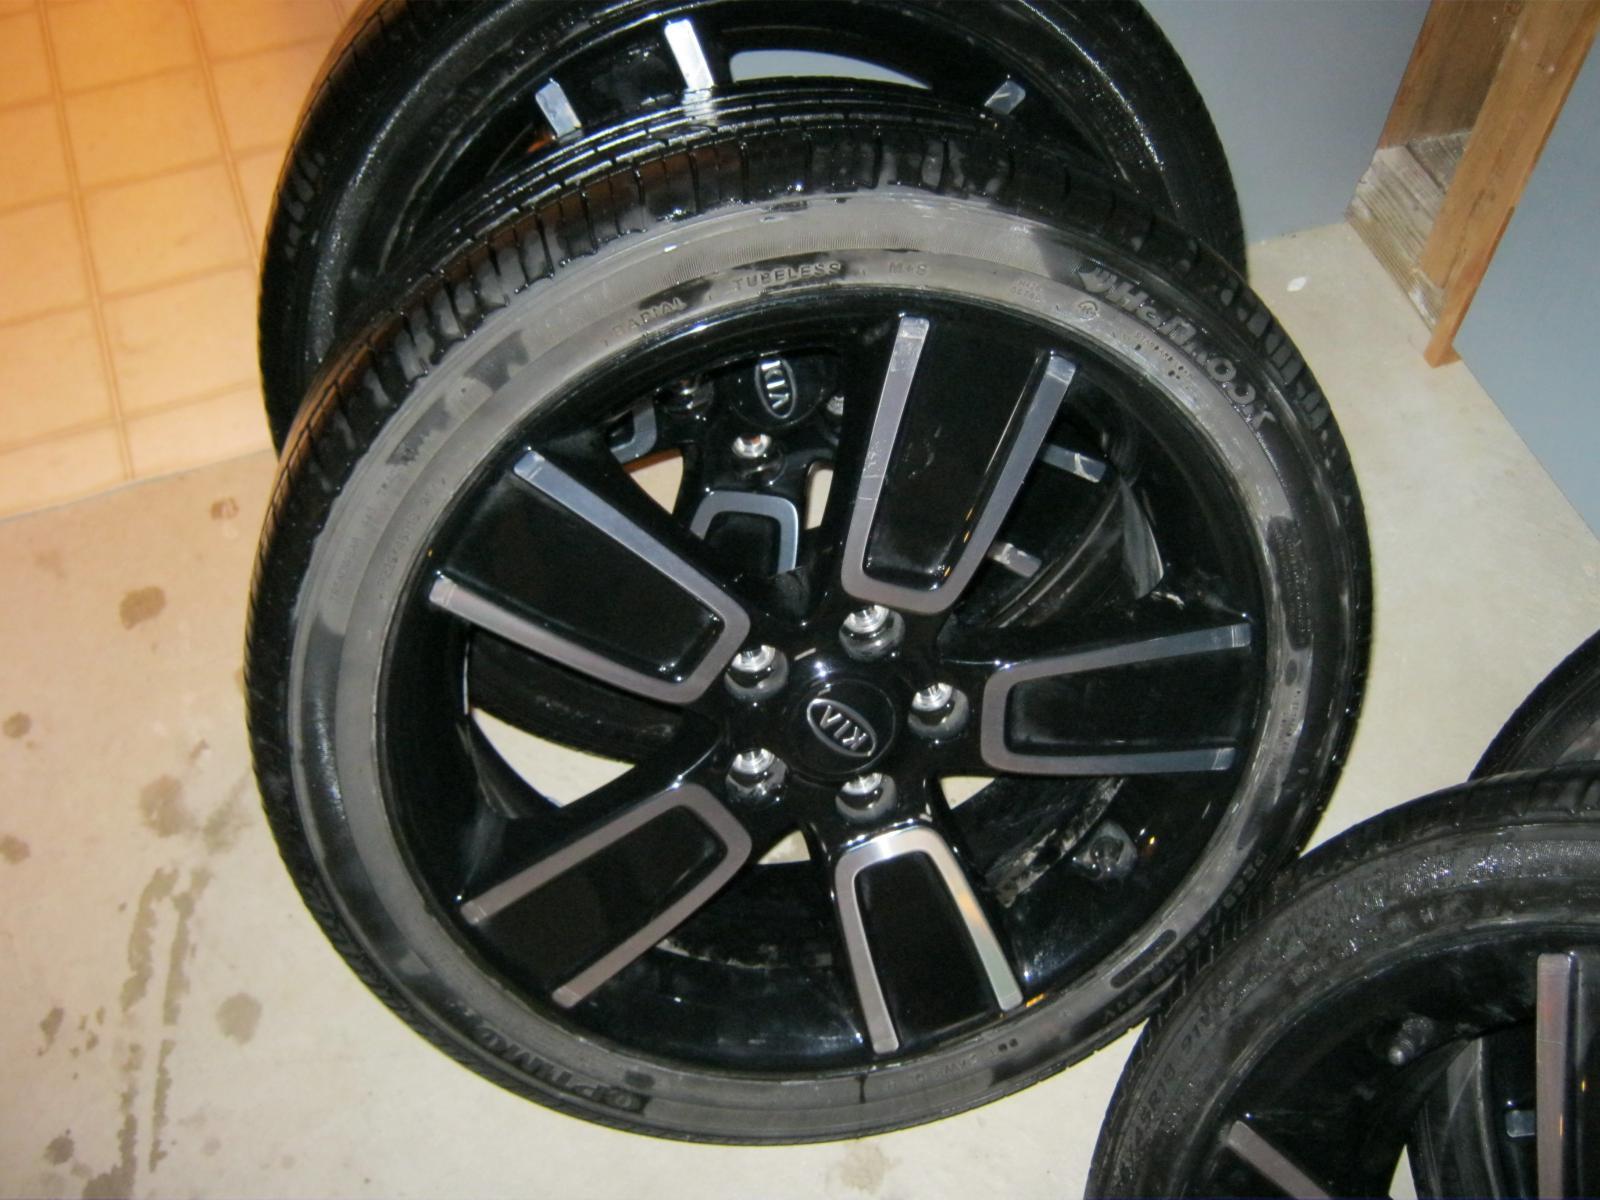 kia sale soul in inventory saskatchewan for hague tires used